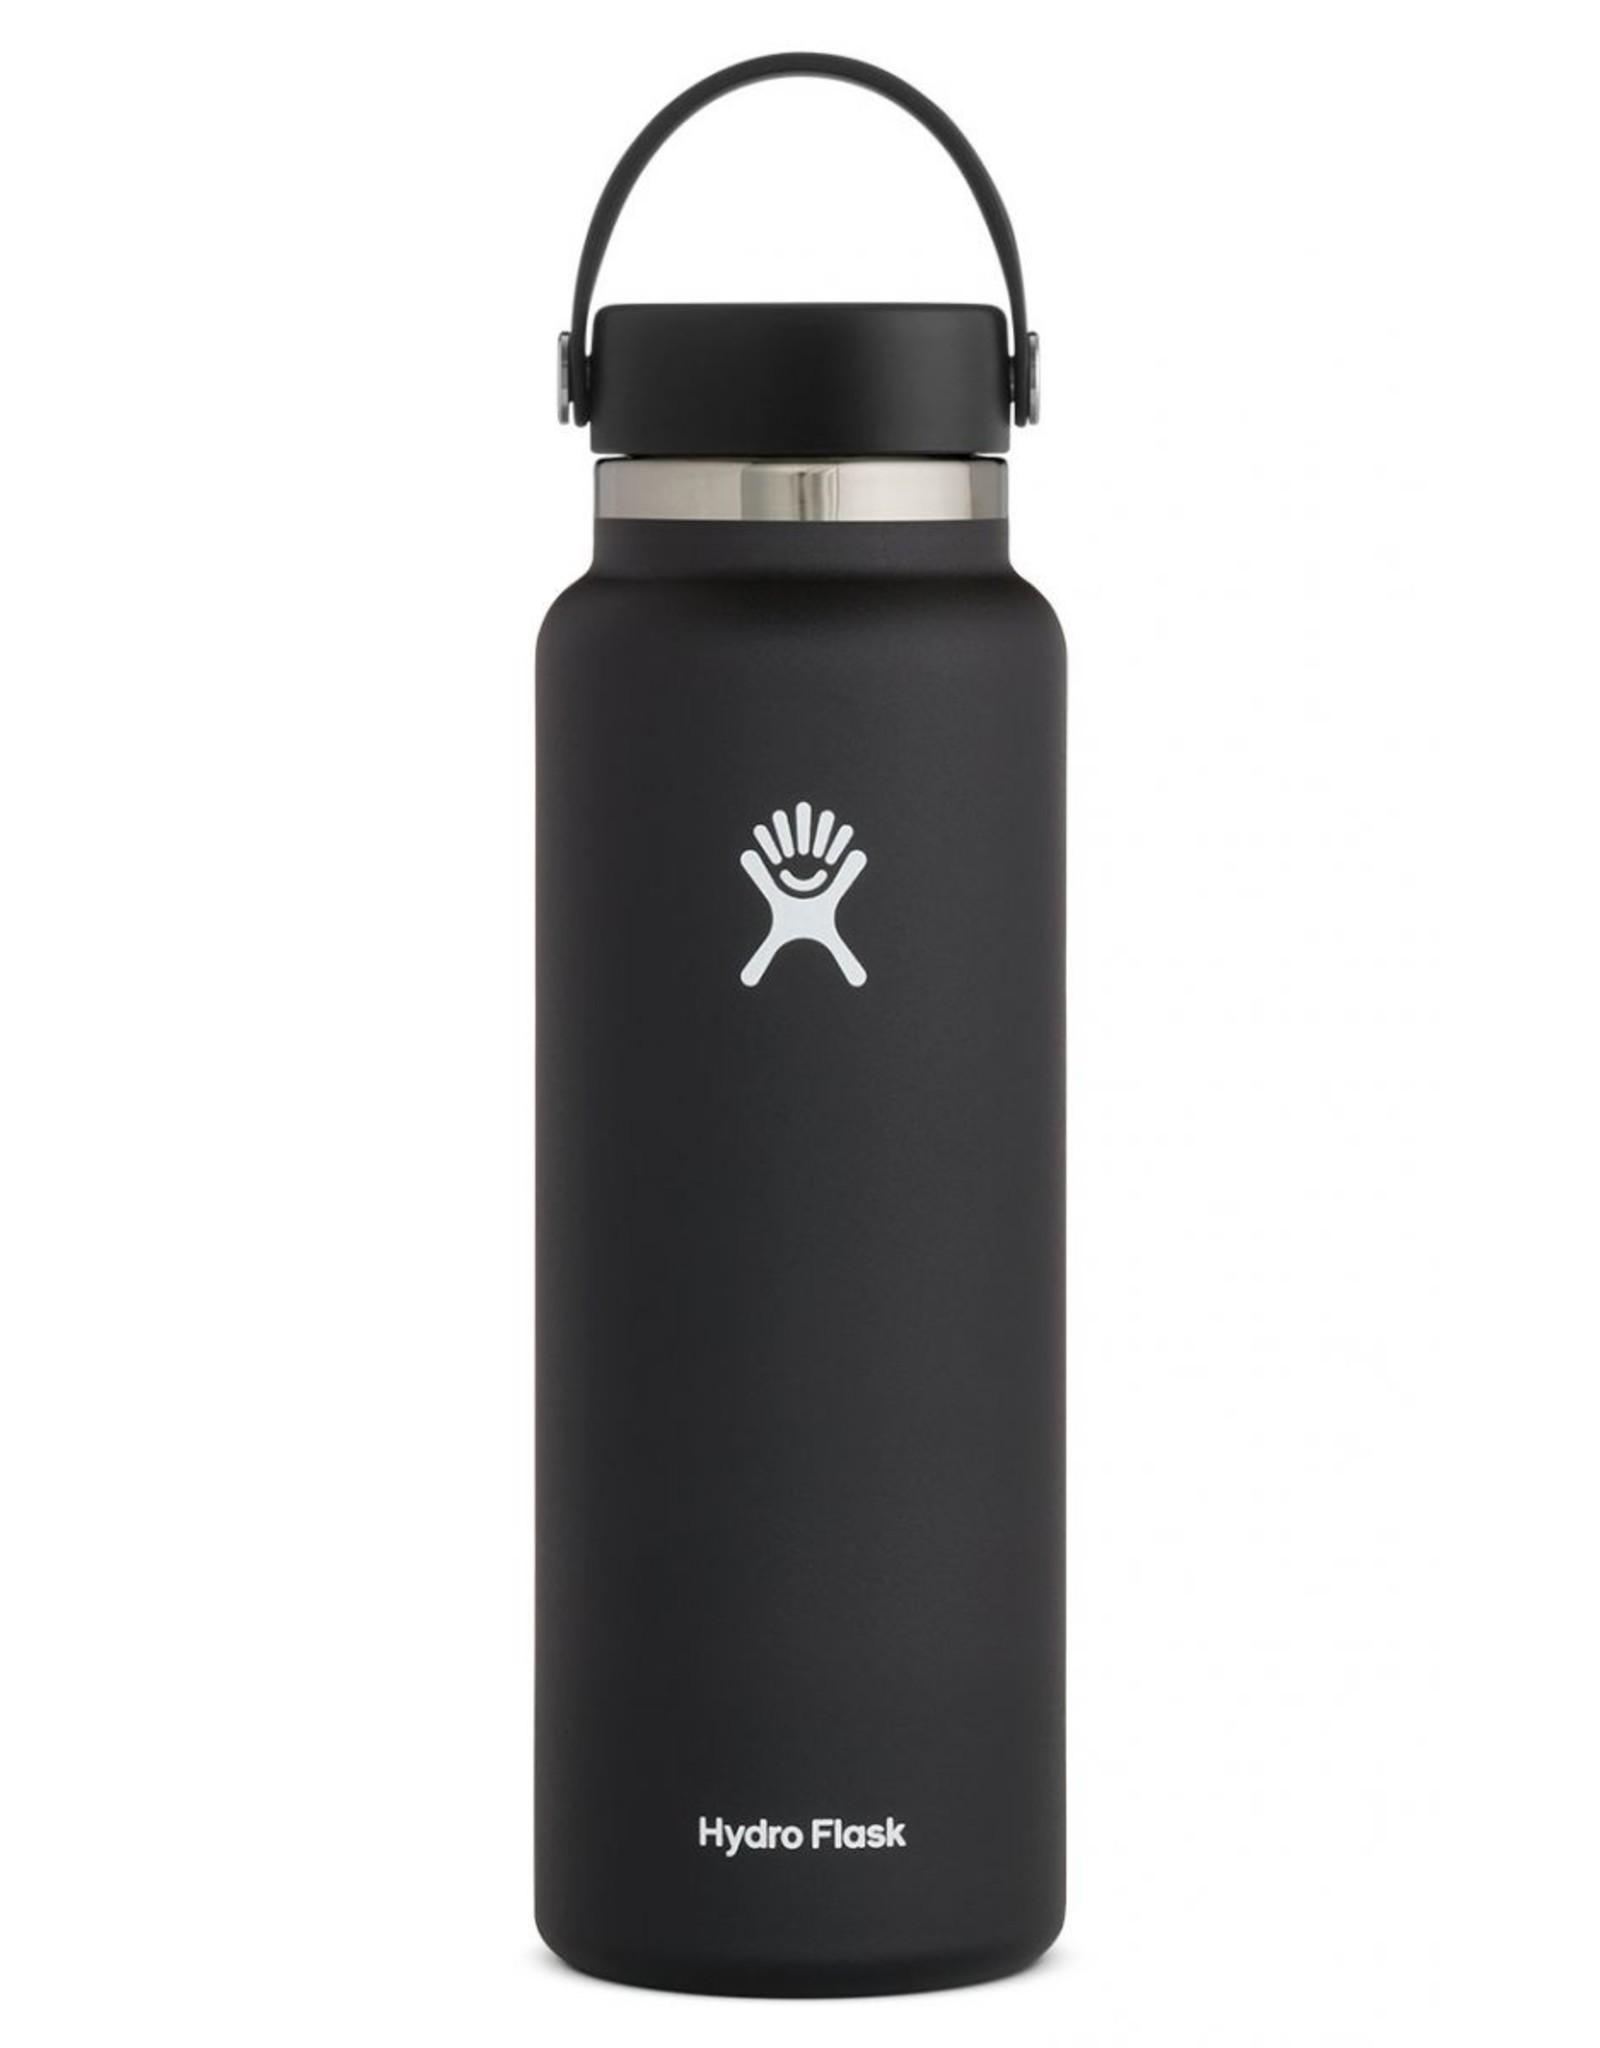 Hydroflask HYDROFLASK 40 OZ WIDE MOUTH 2.0 FLEX CAP